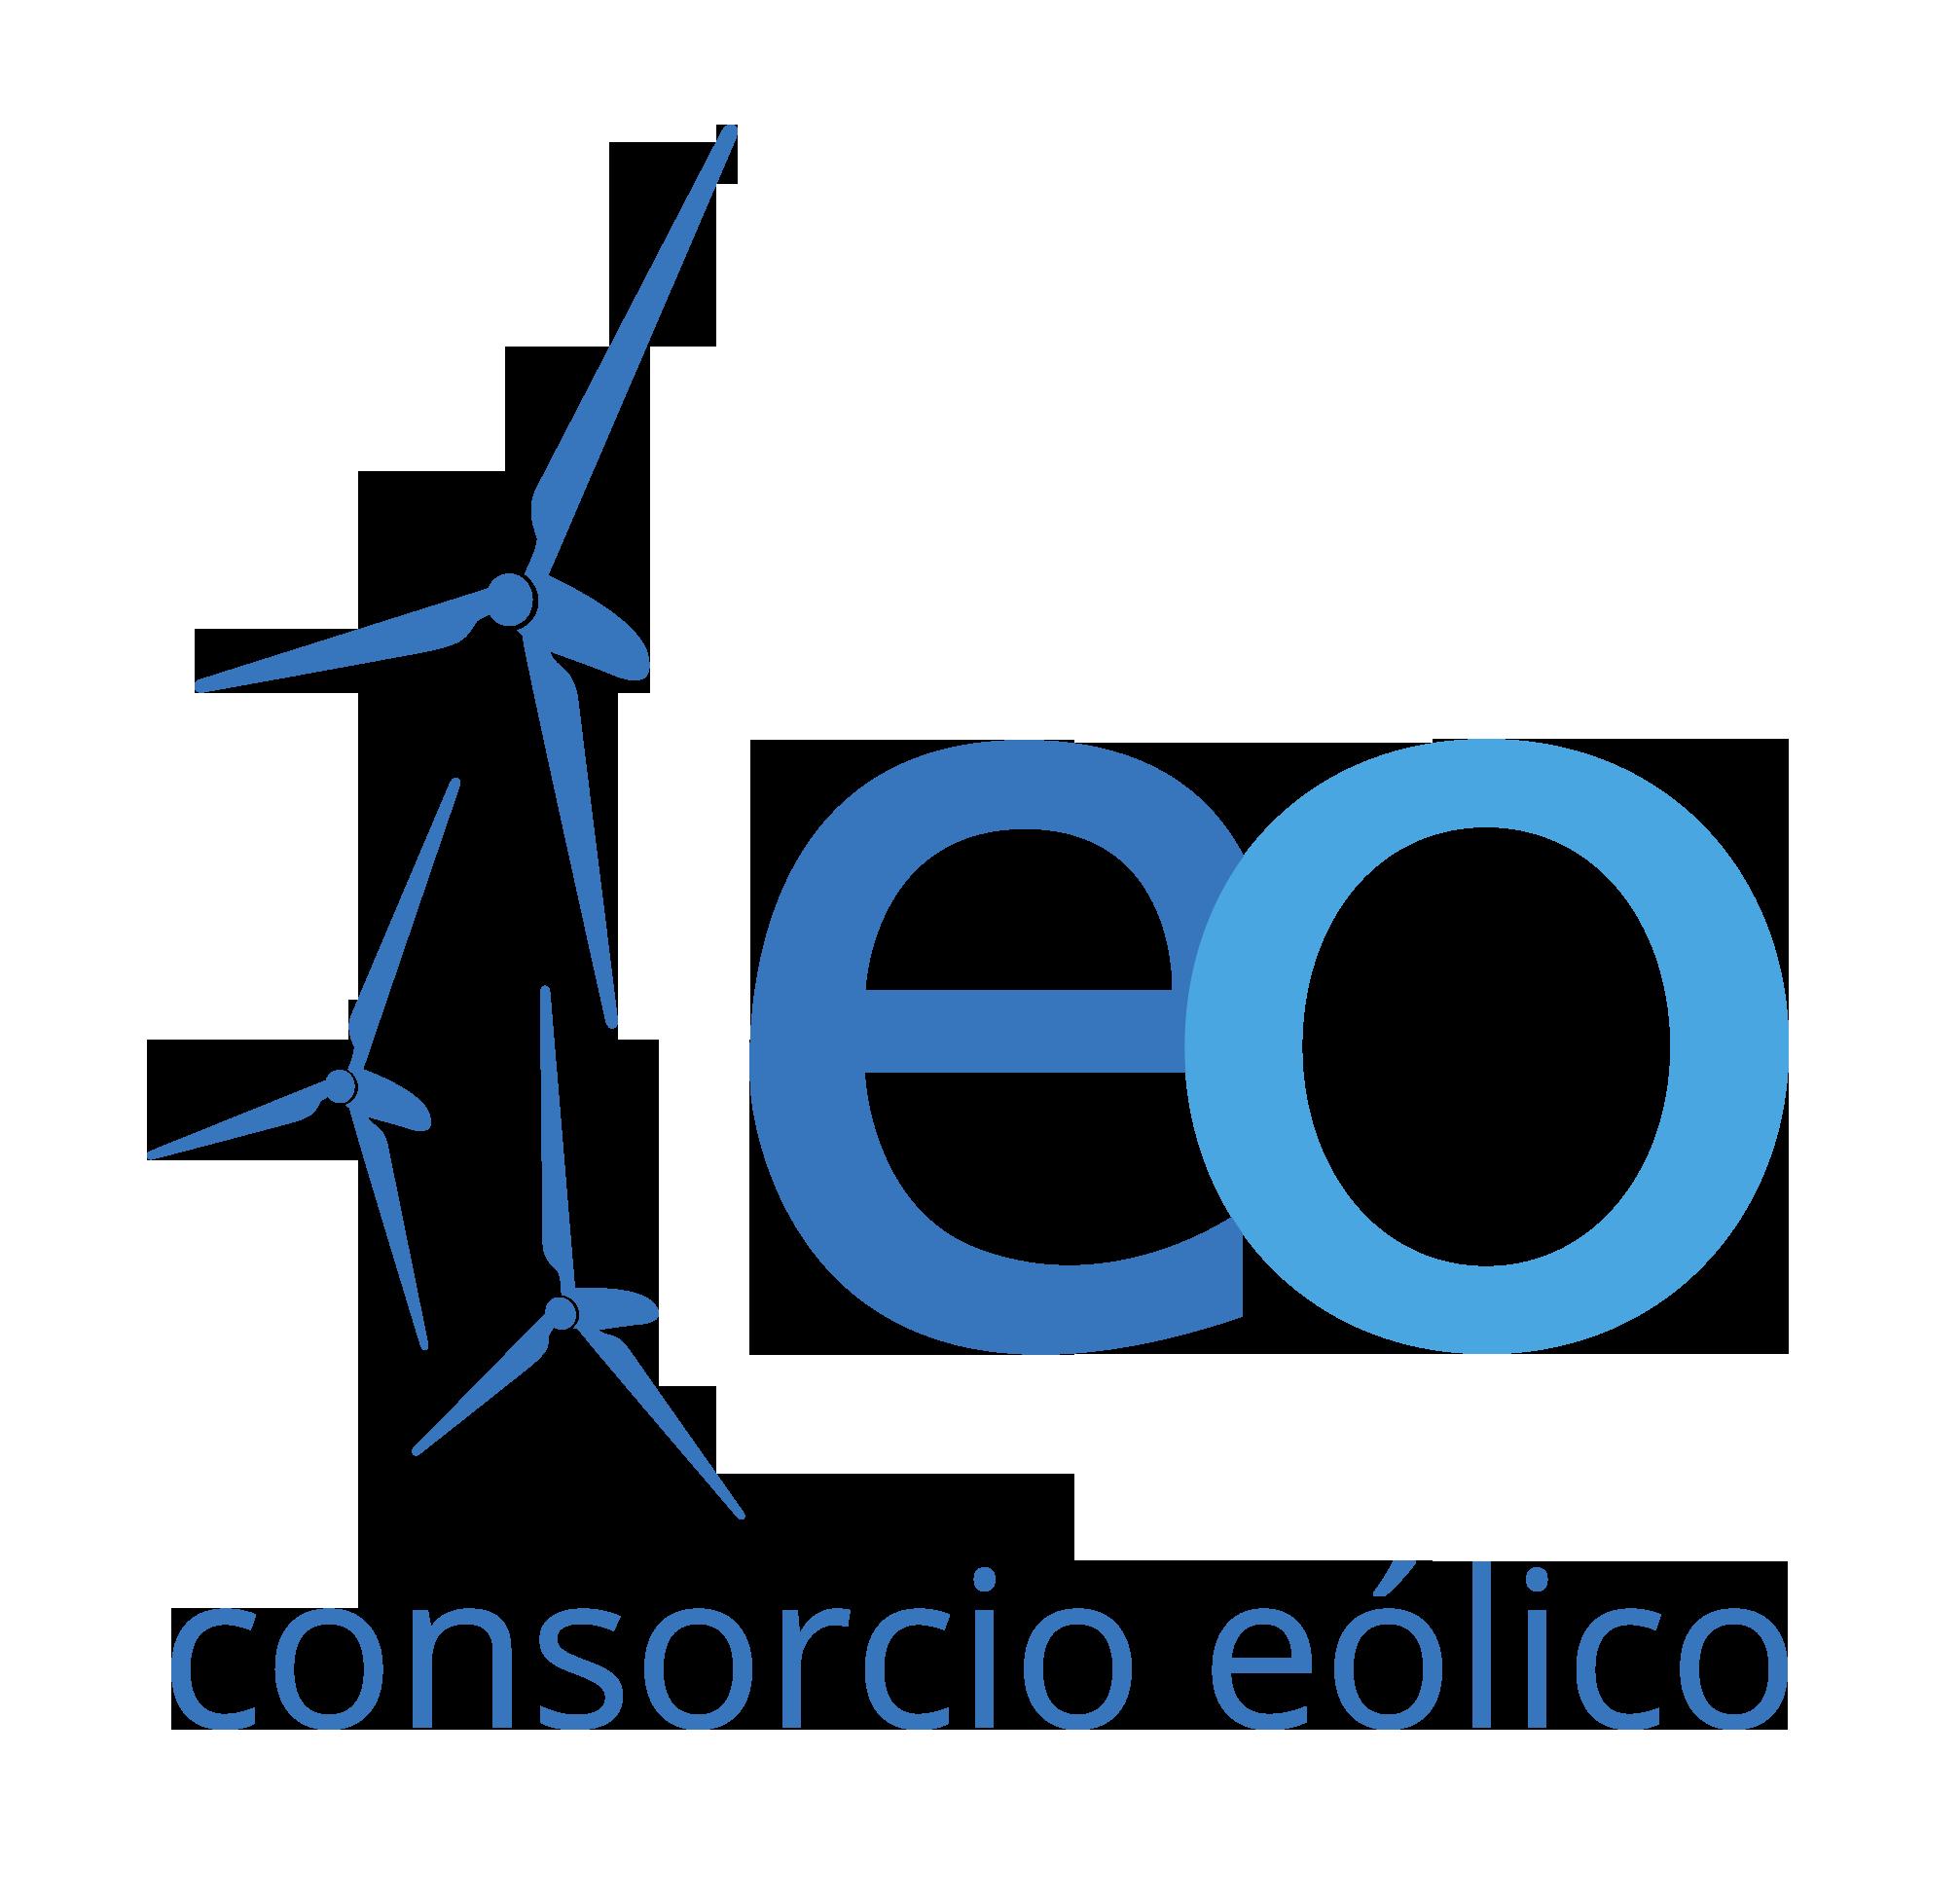 Consorcio Eólico